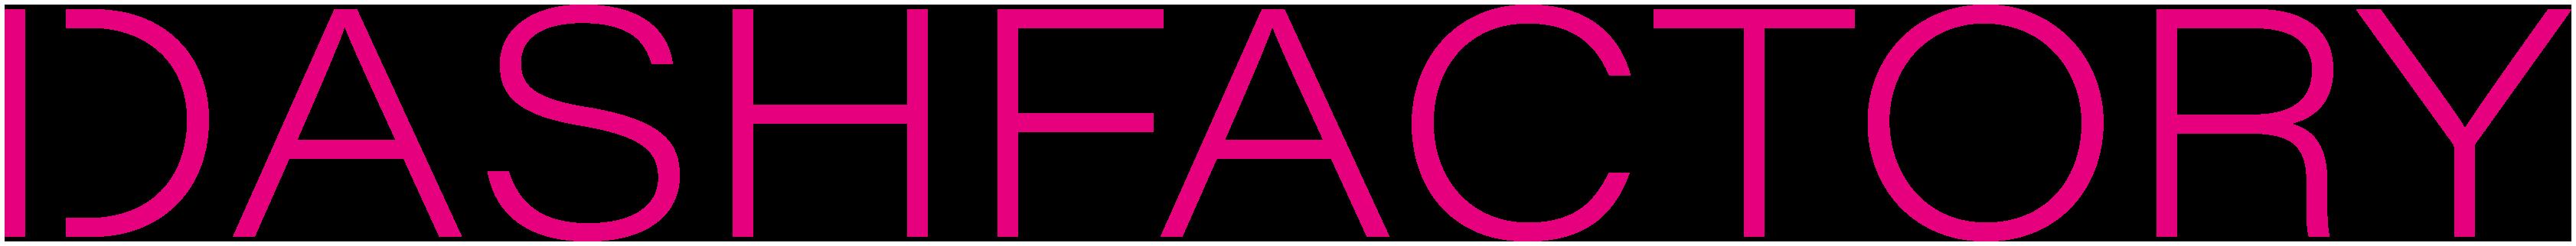 dashfactory_logo